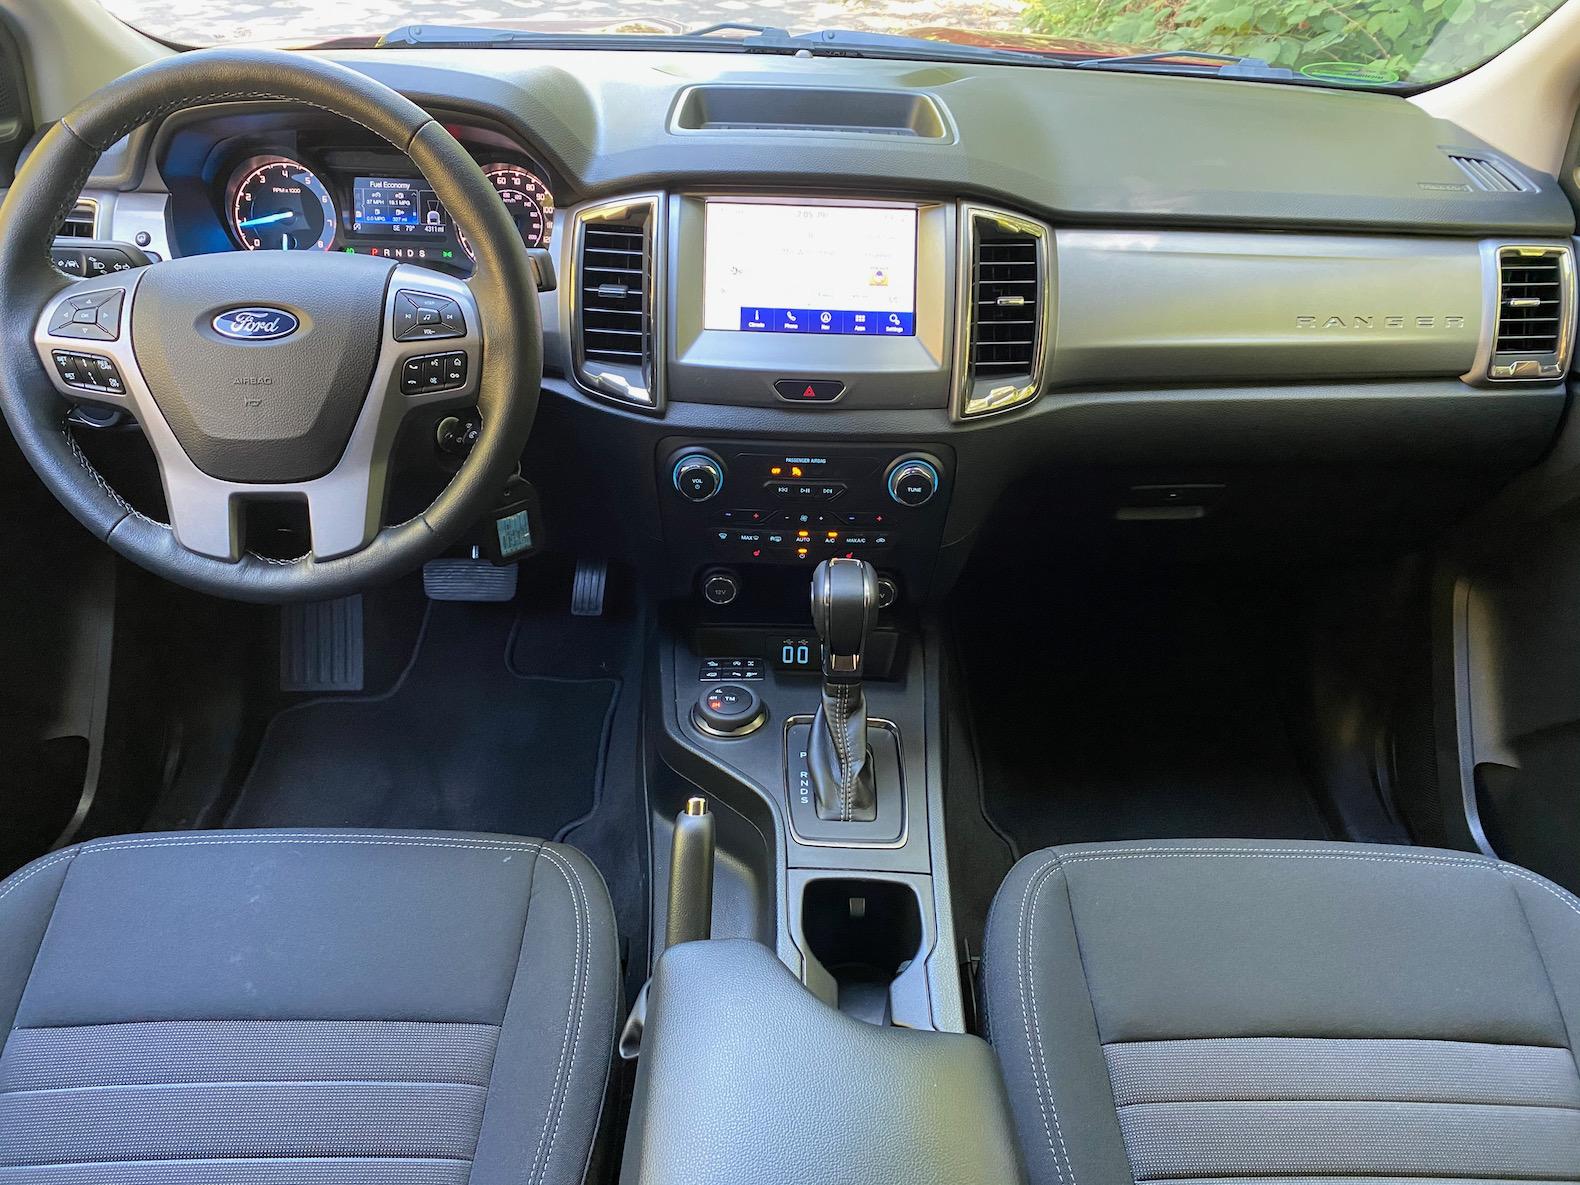 2020 Ford Ranger Review